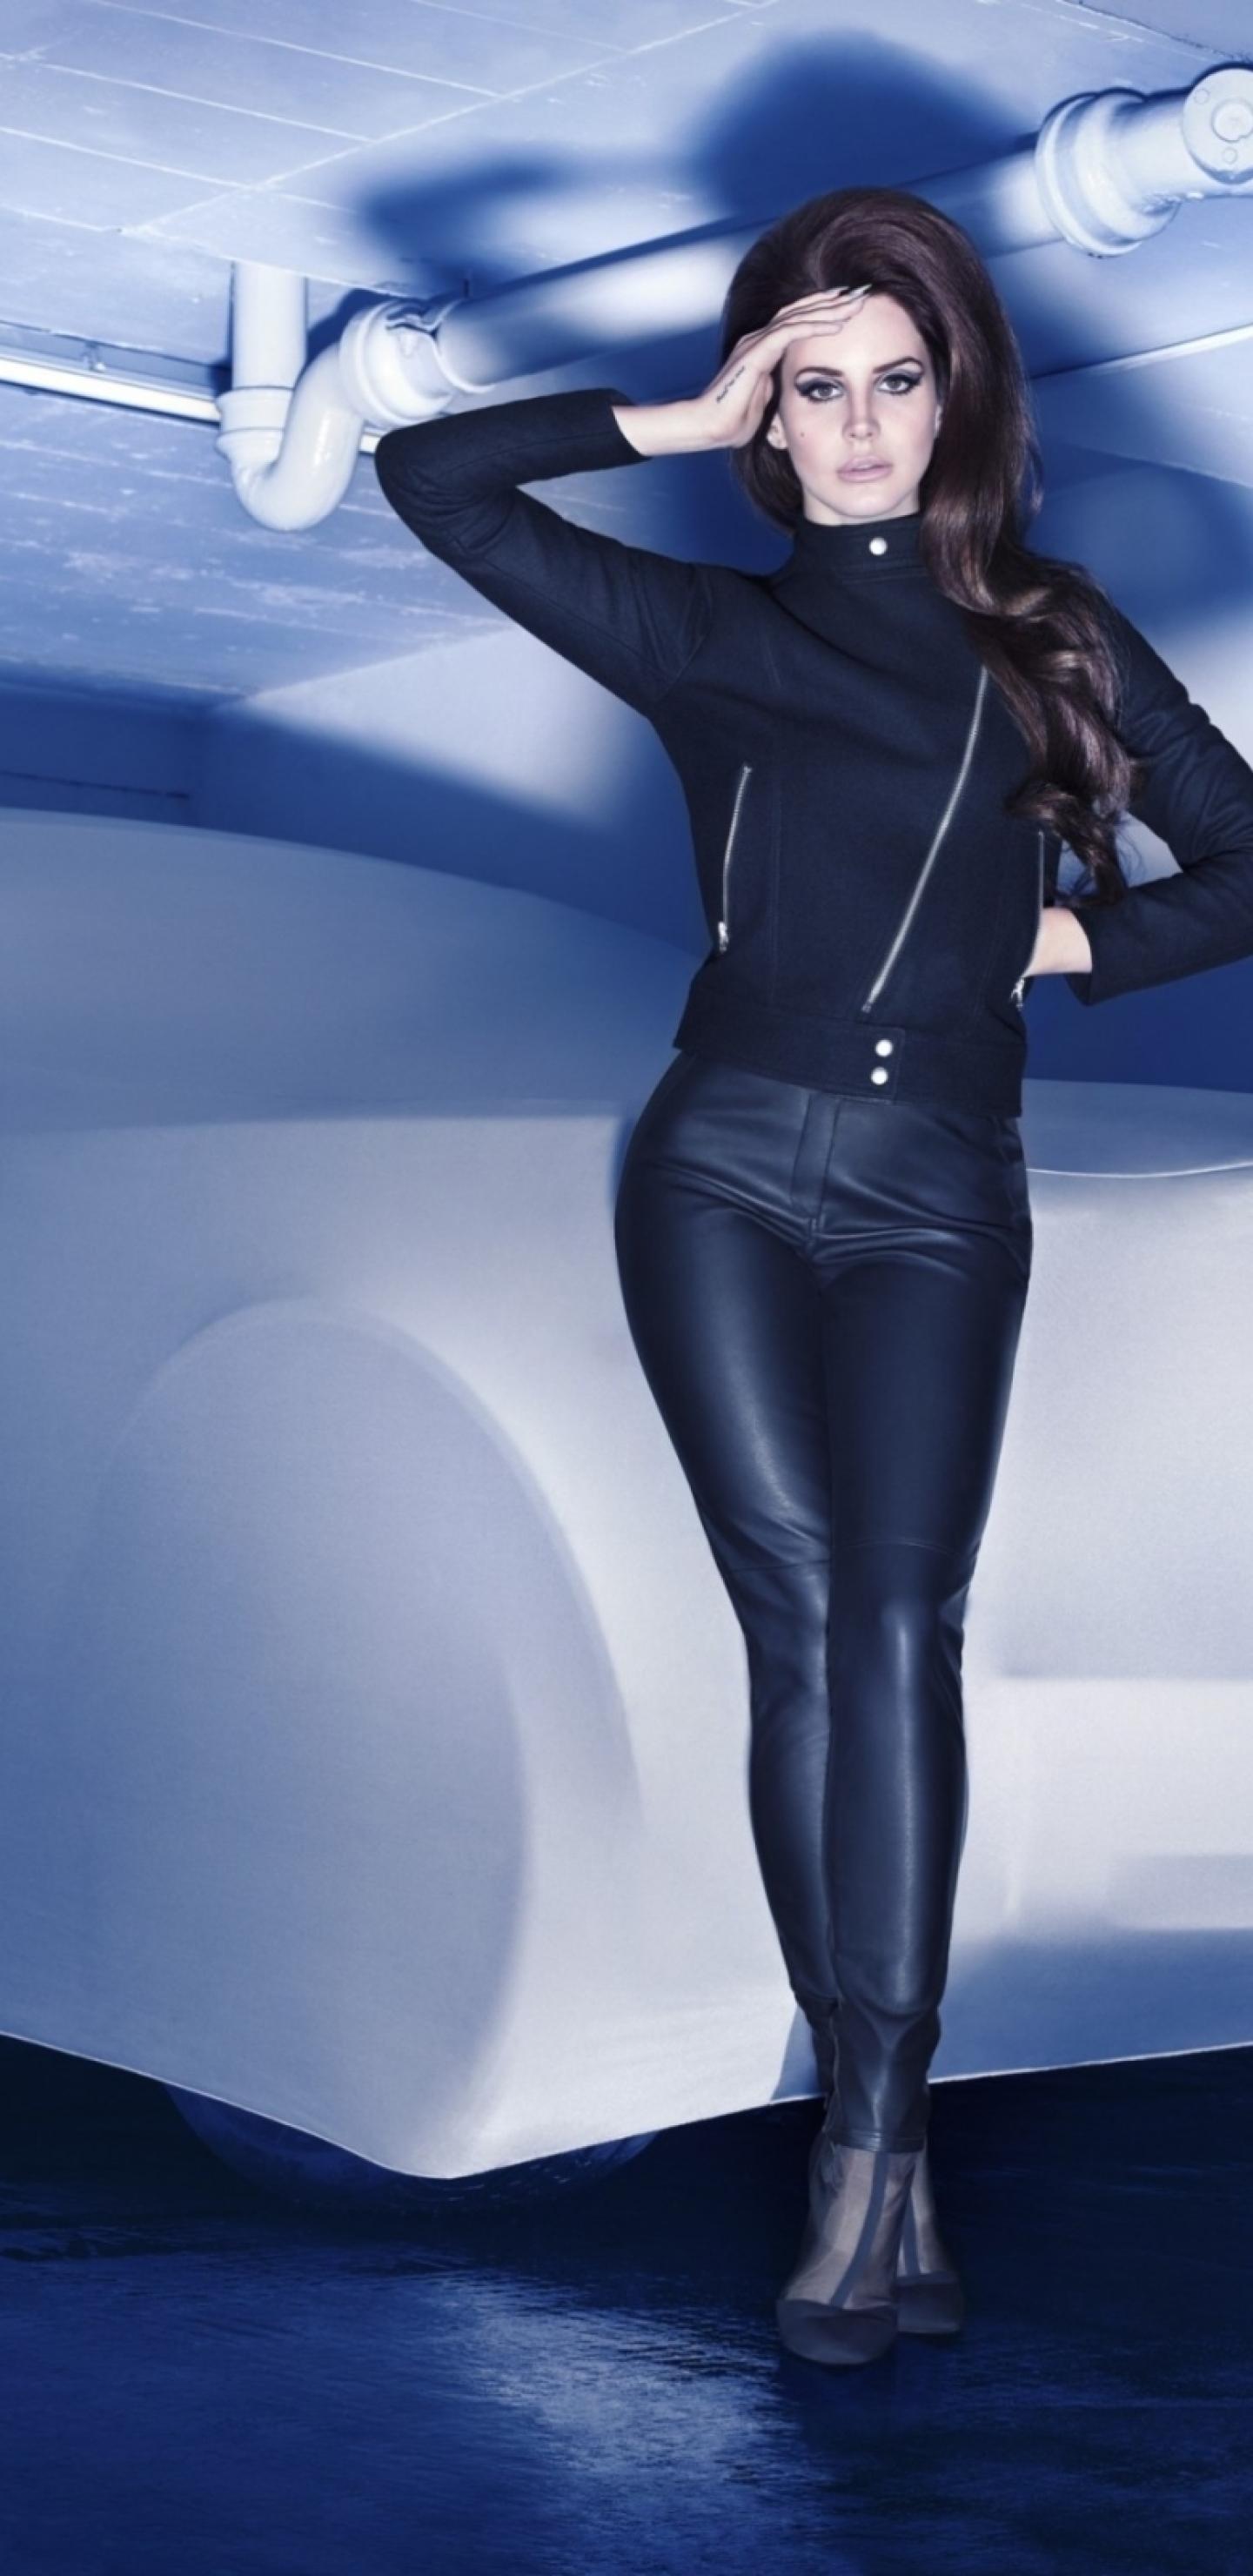 1440x2960 Lana Del Rey In Black Wallpapers Samsung Galaxy Note 9 8